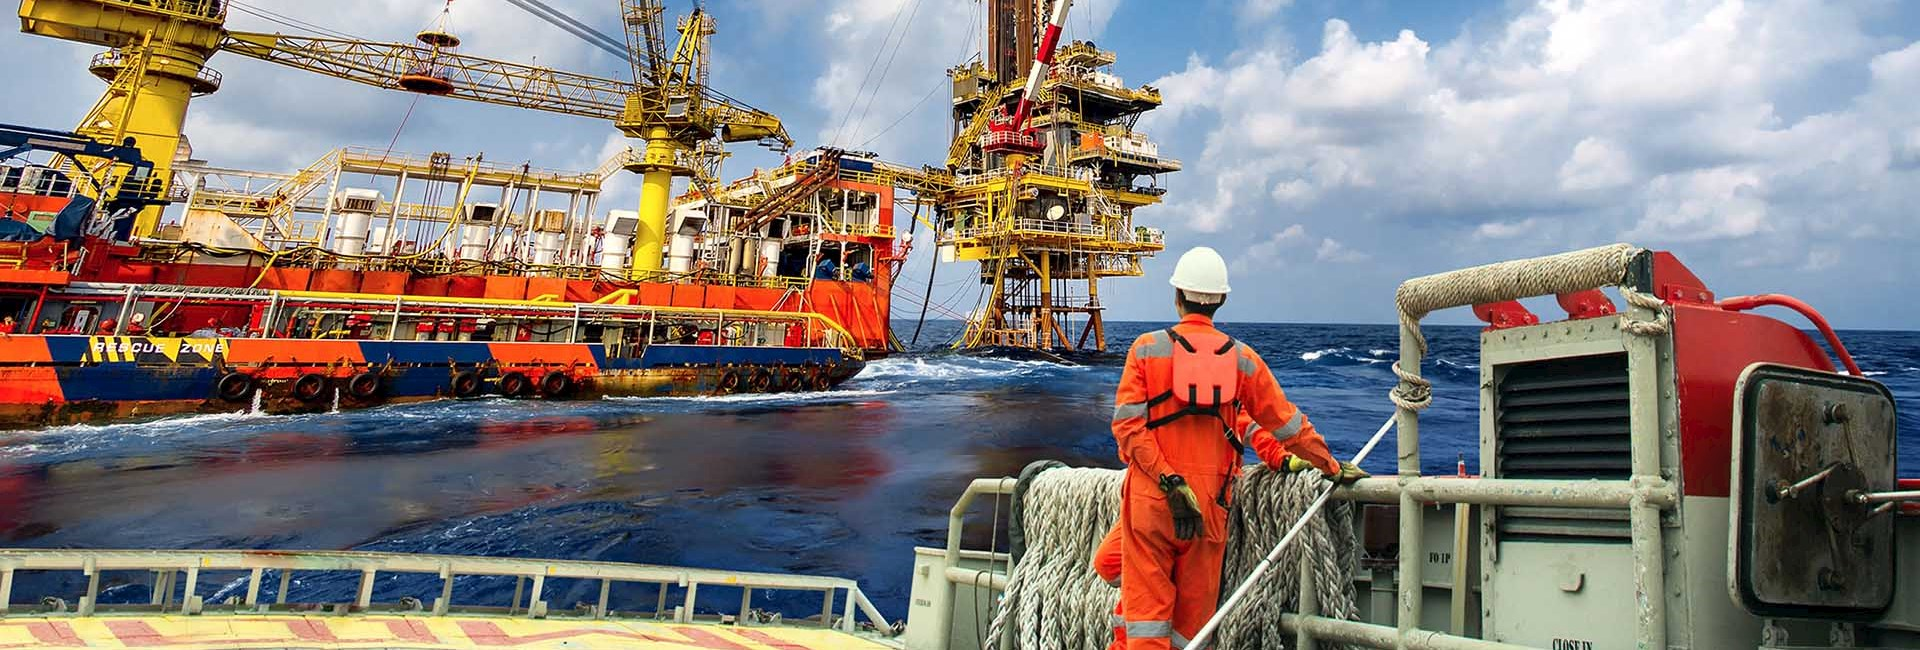 Offshore oil platform worker